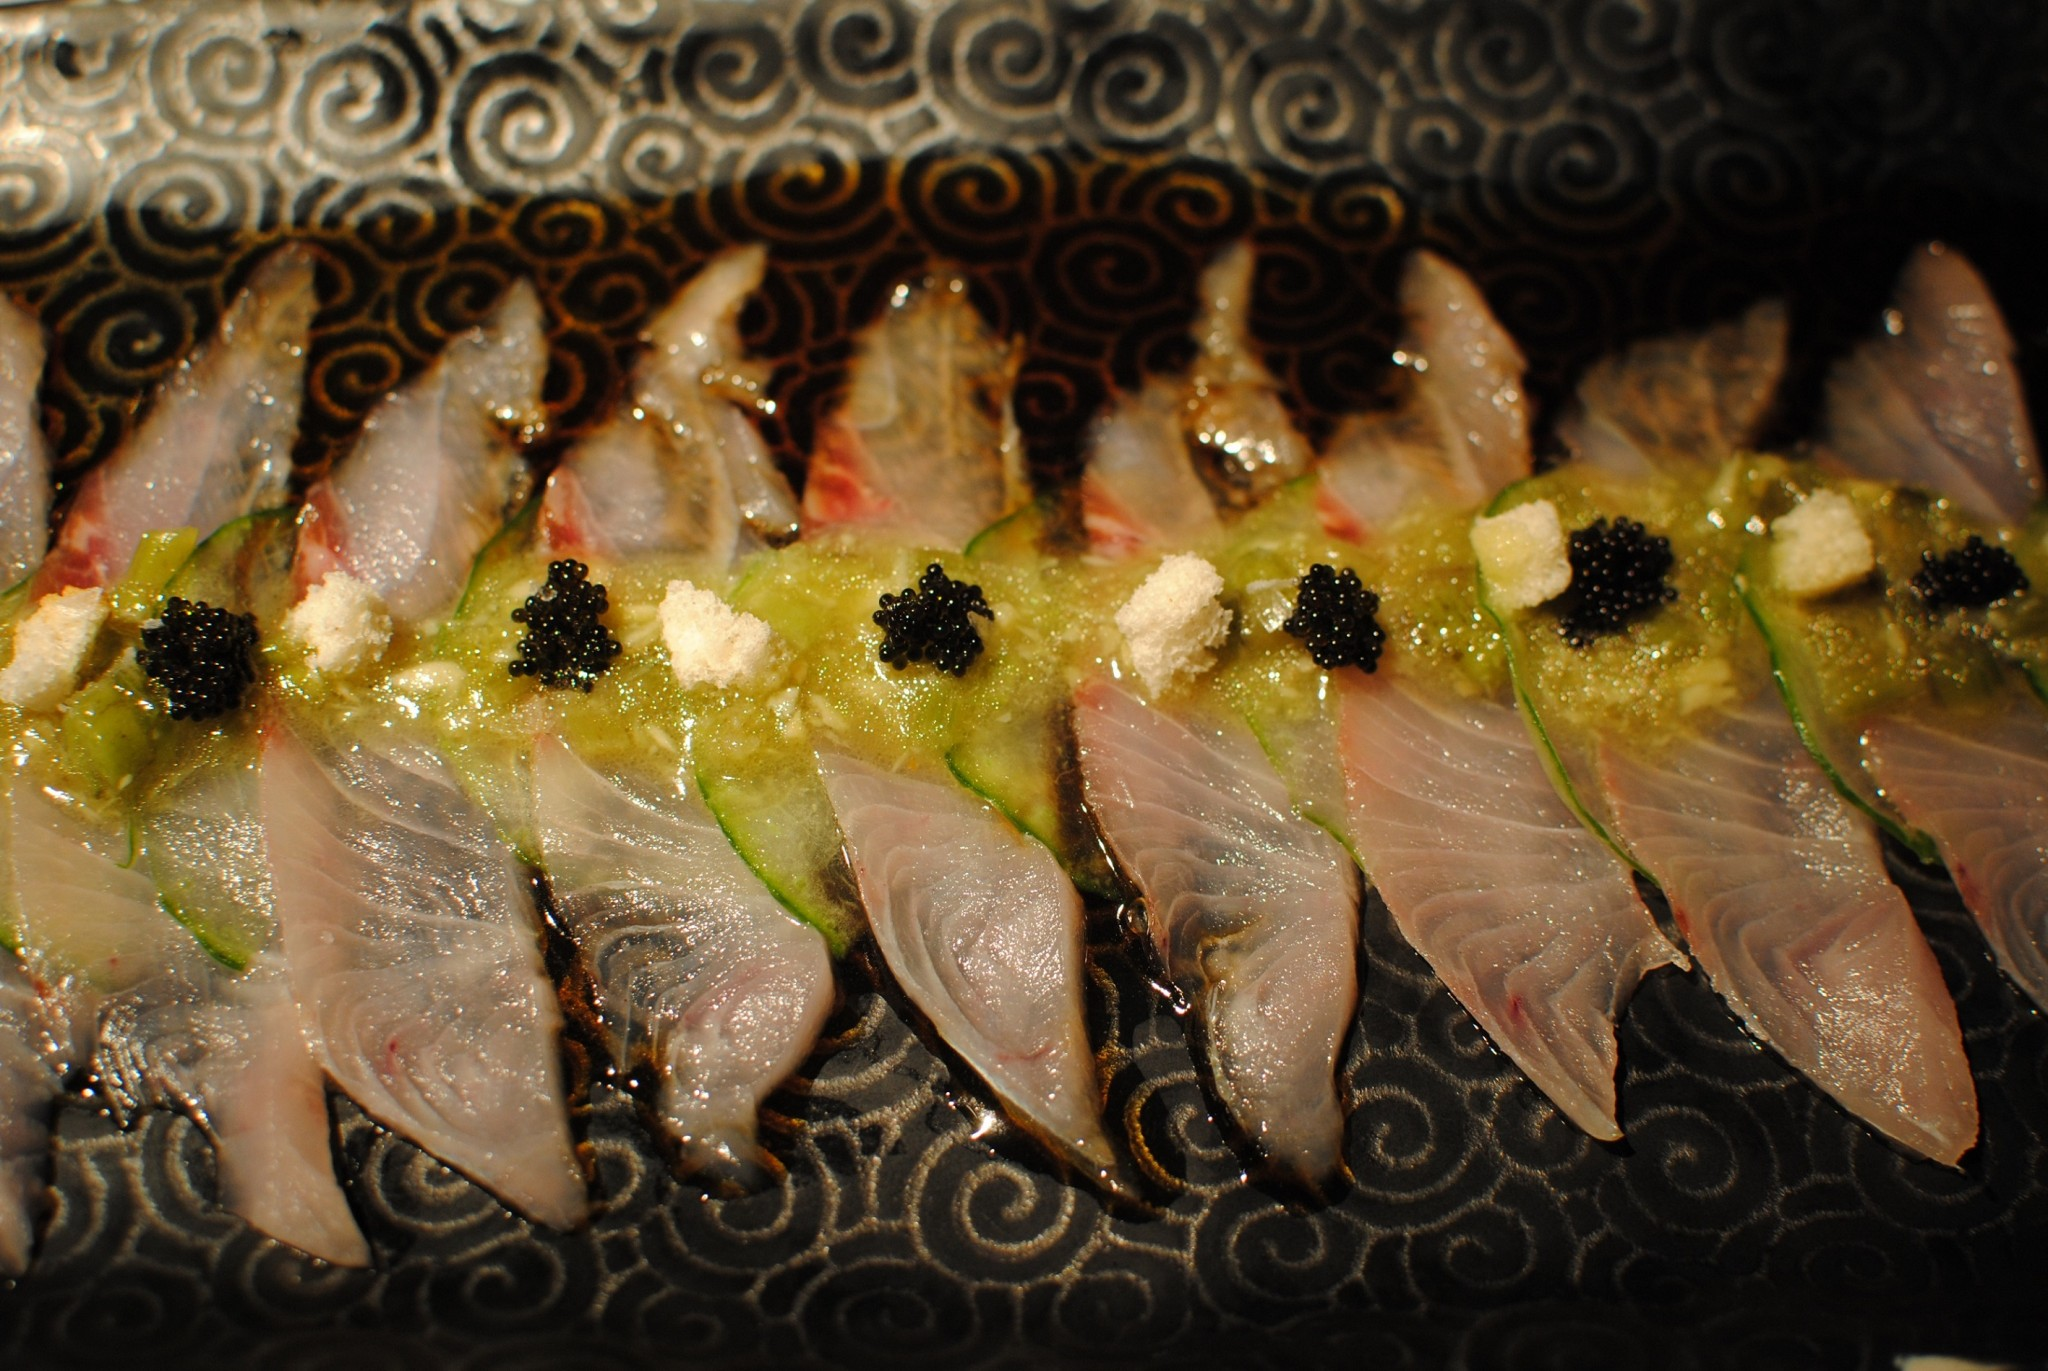 99 Sushi Bar Usuzukukimujol